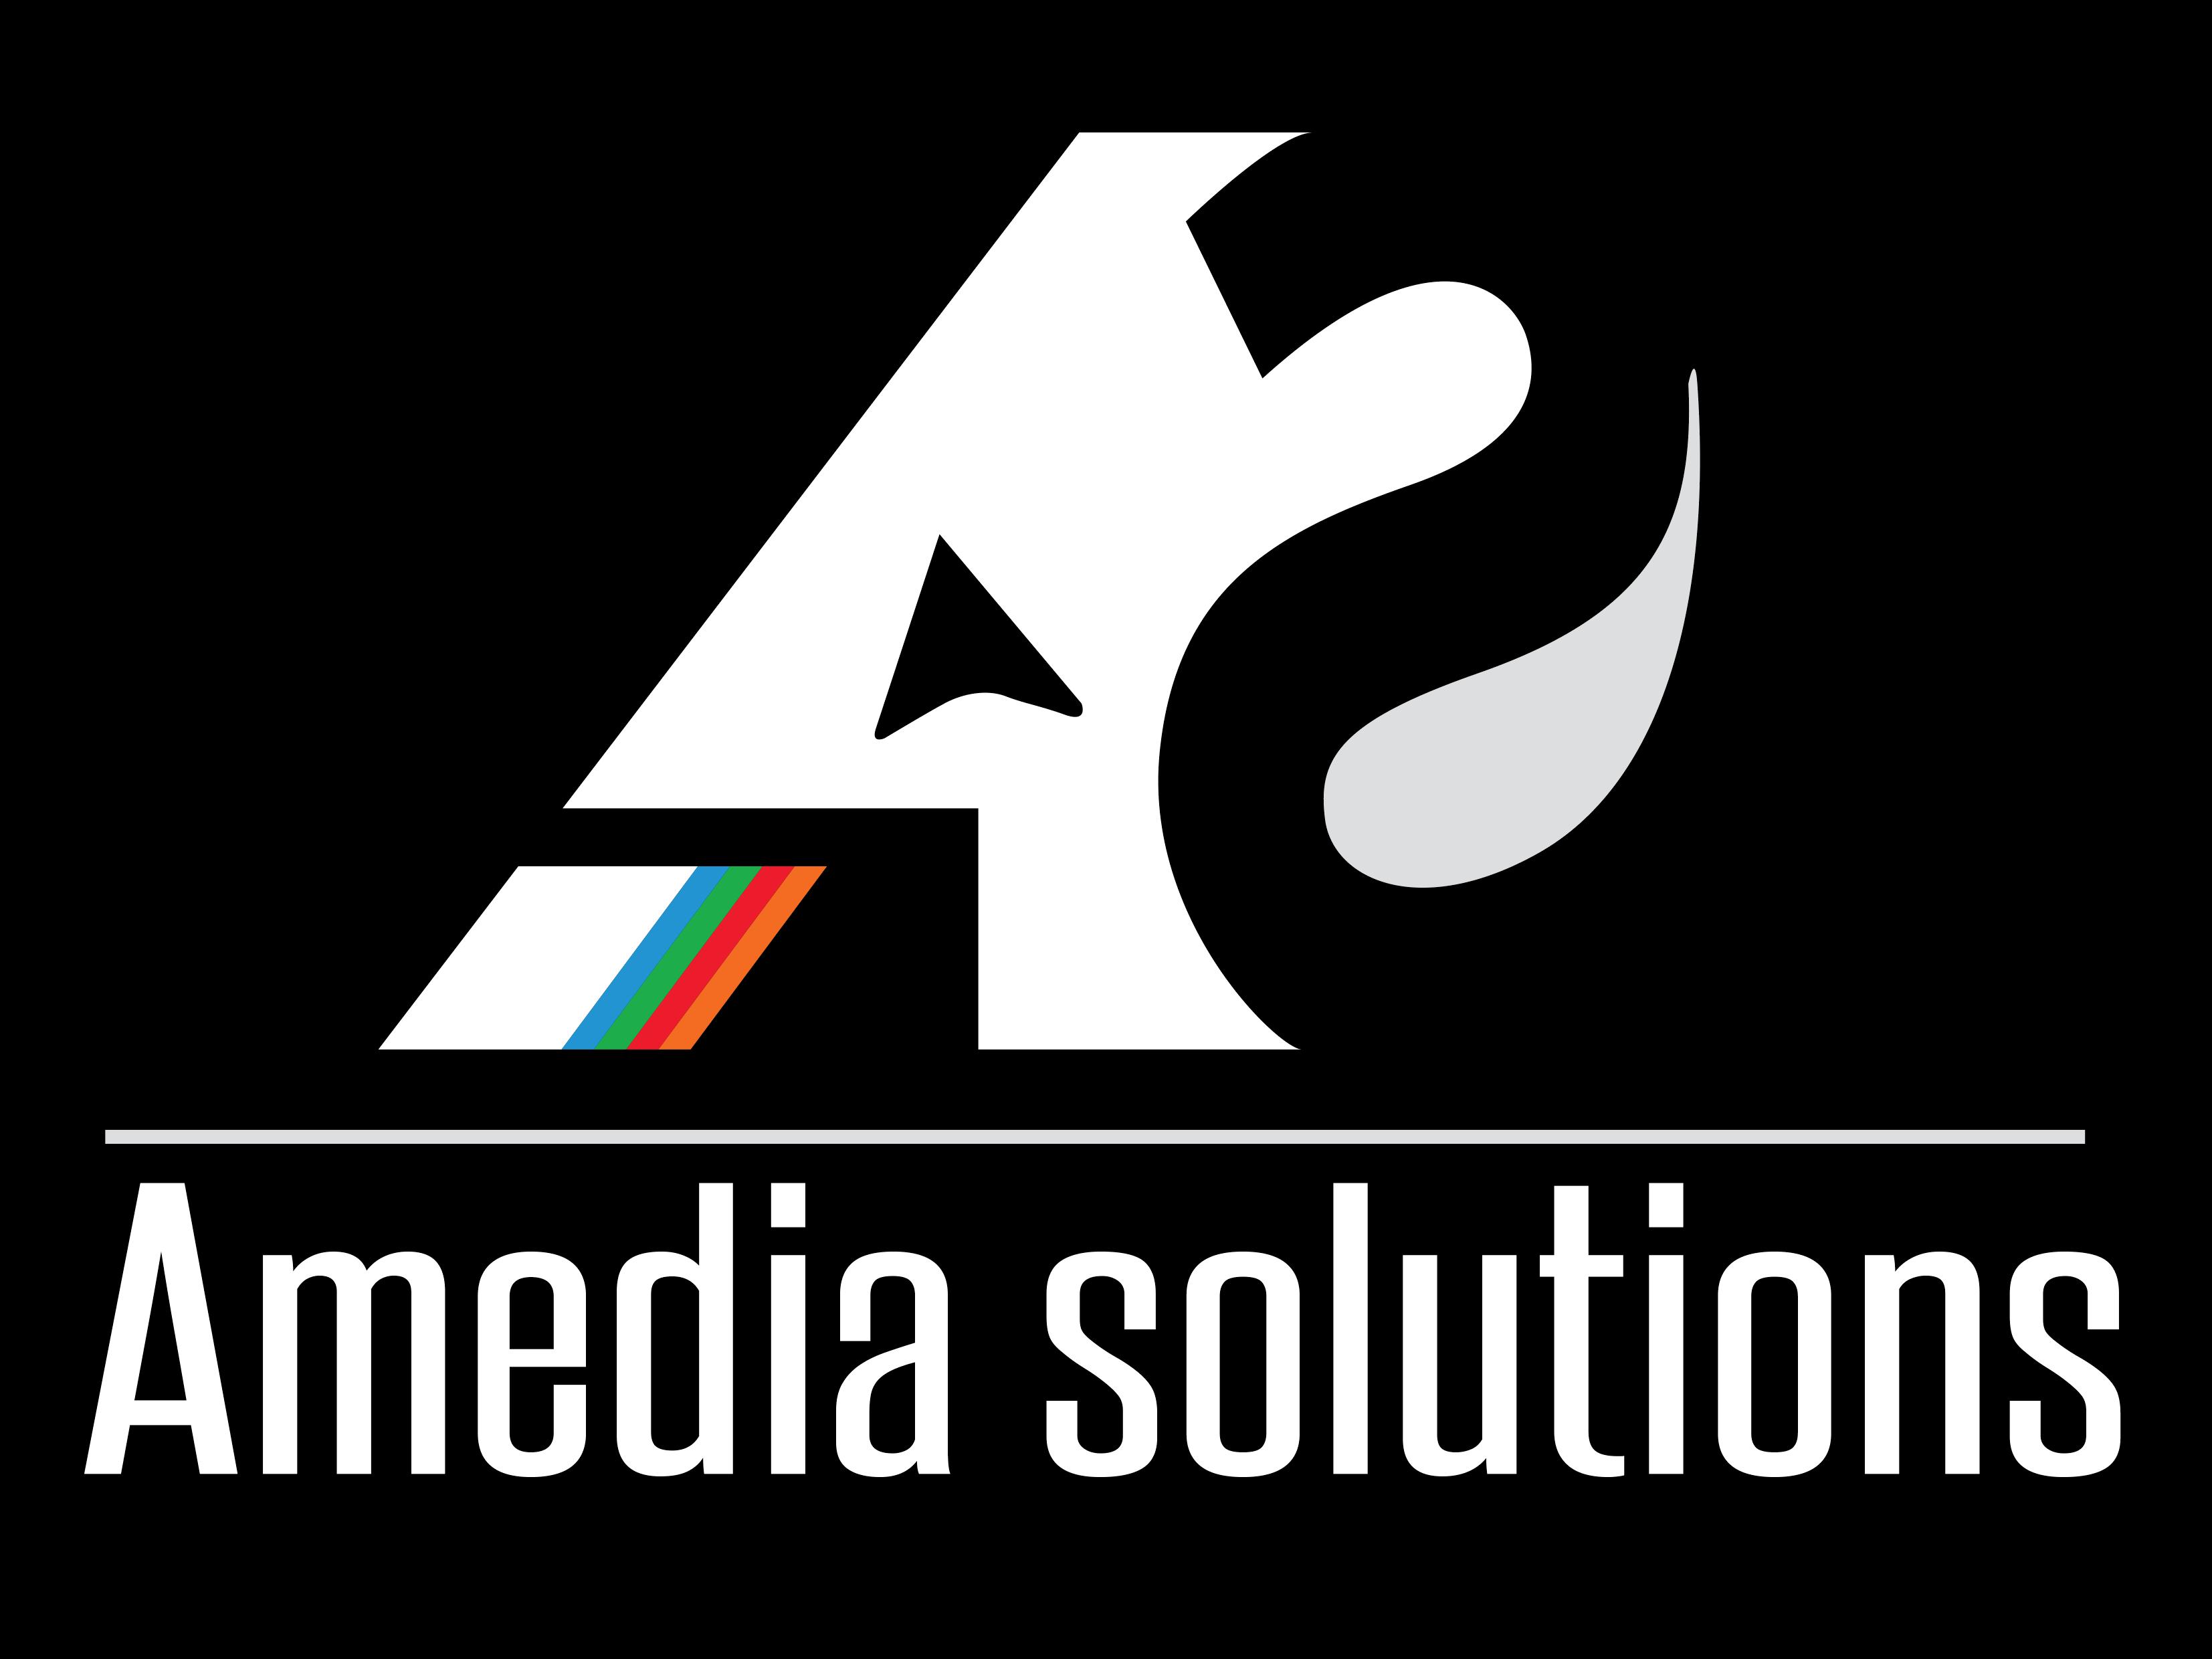 Le blog Amedia Solutions